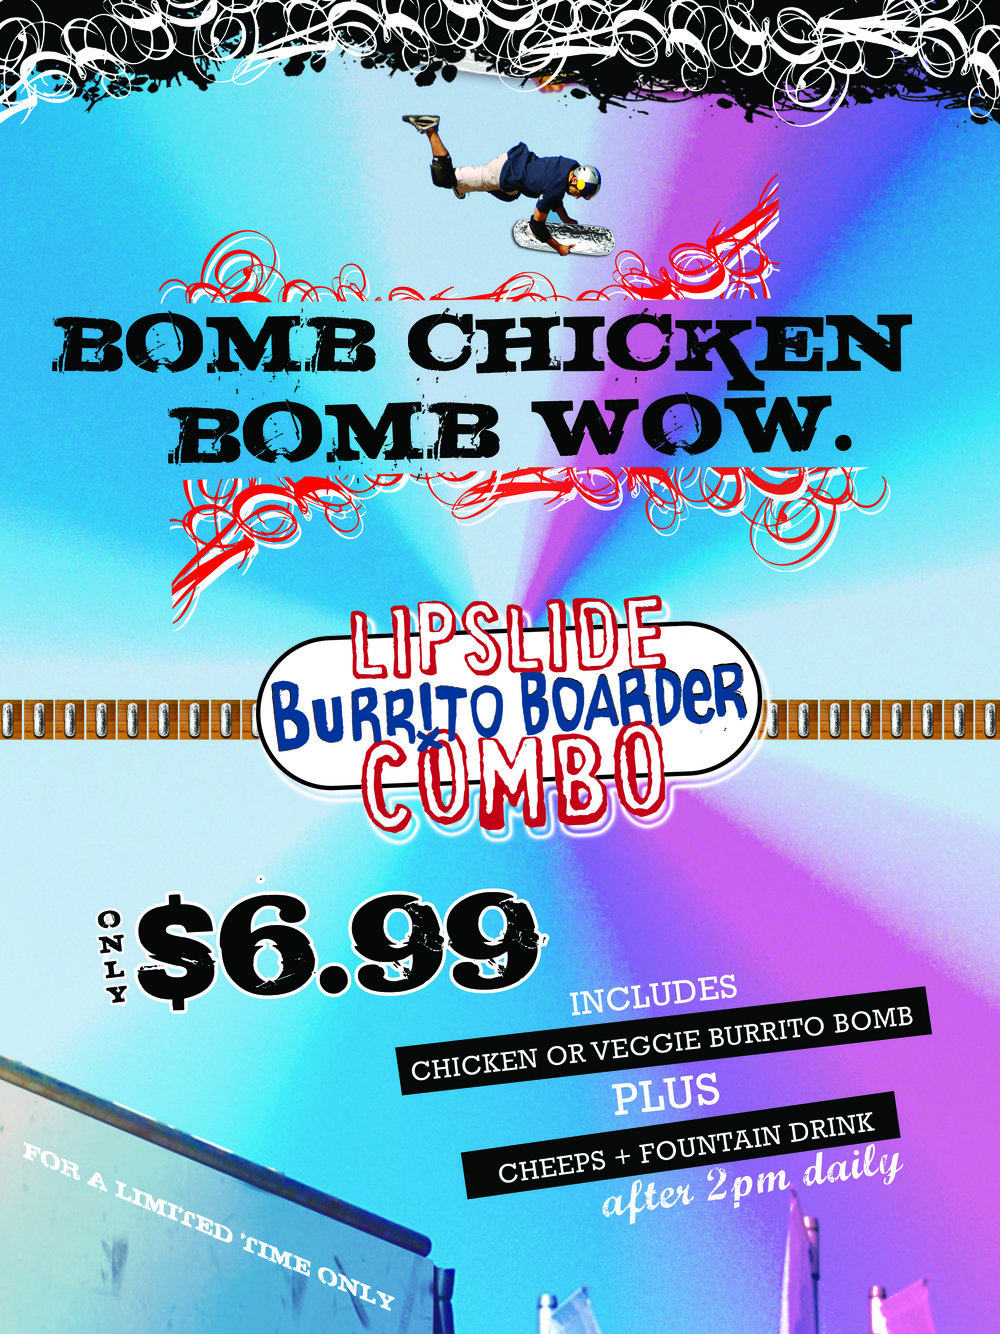 Burrito Boarder | print, digital, POS, apparel